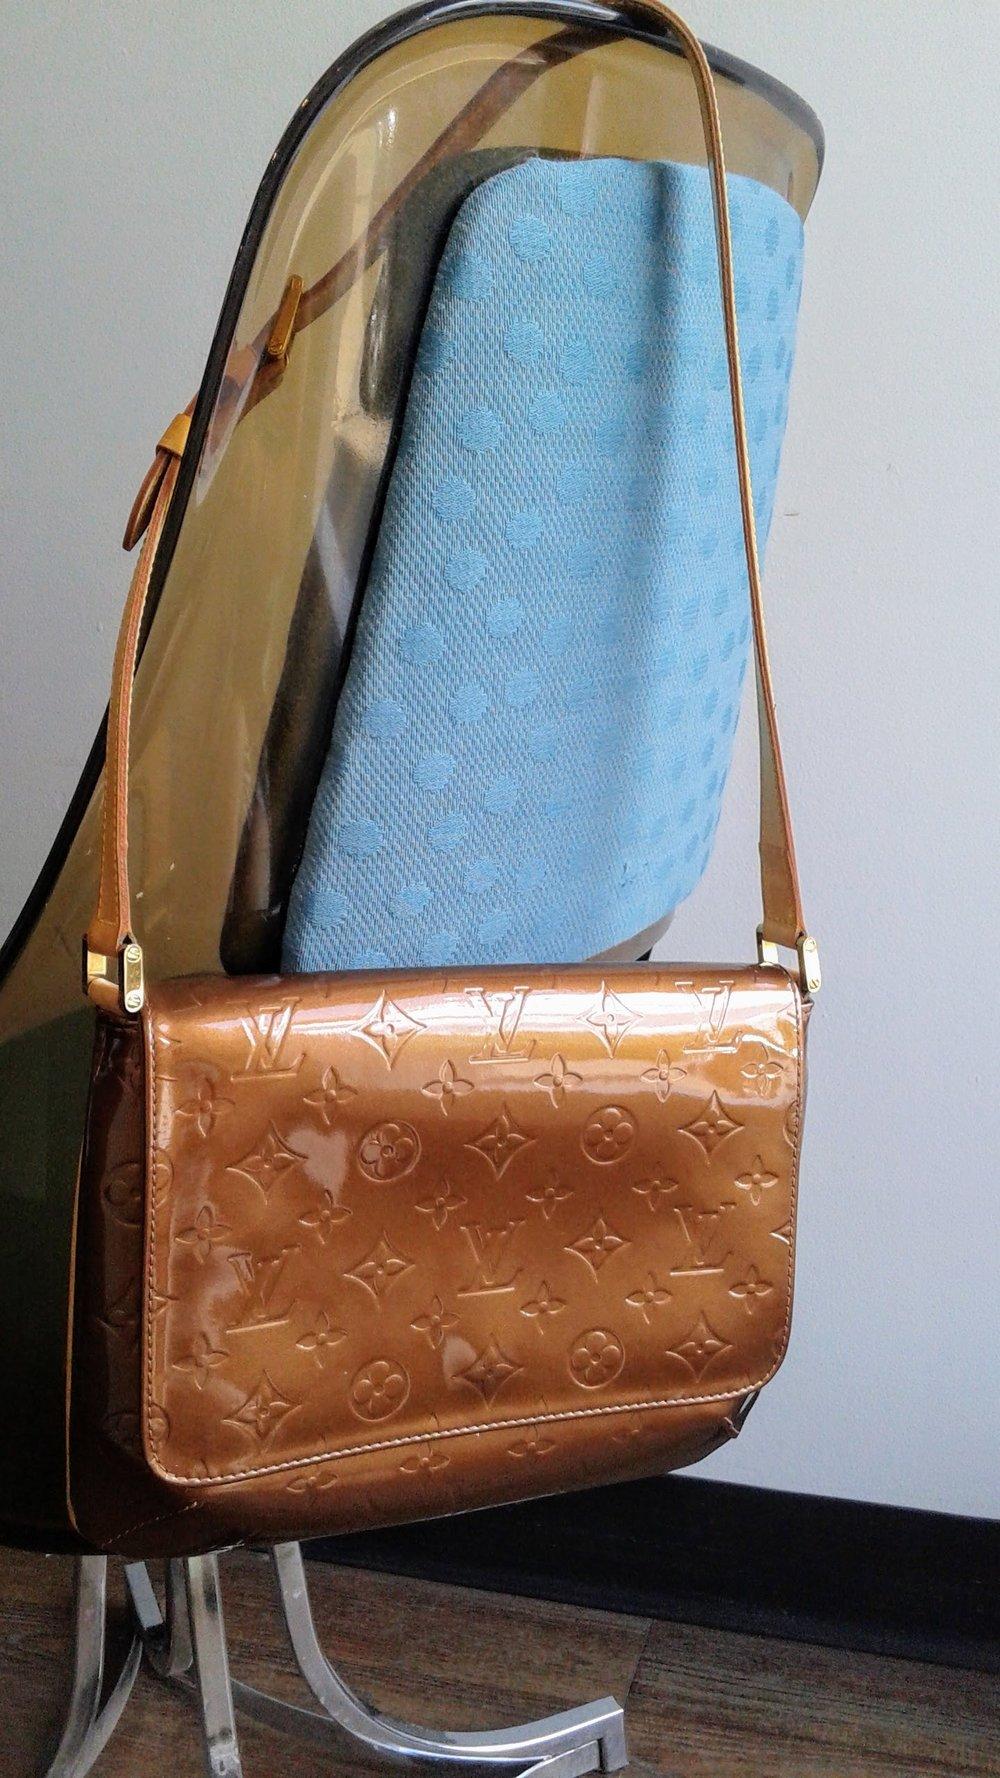 Louis Vuitton purse, $275